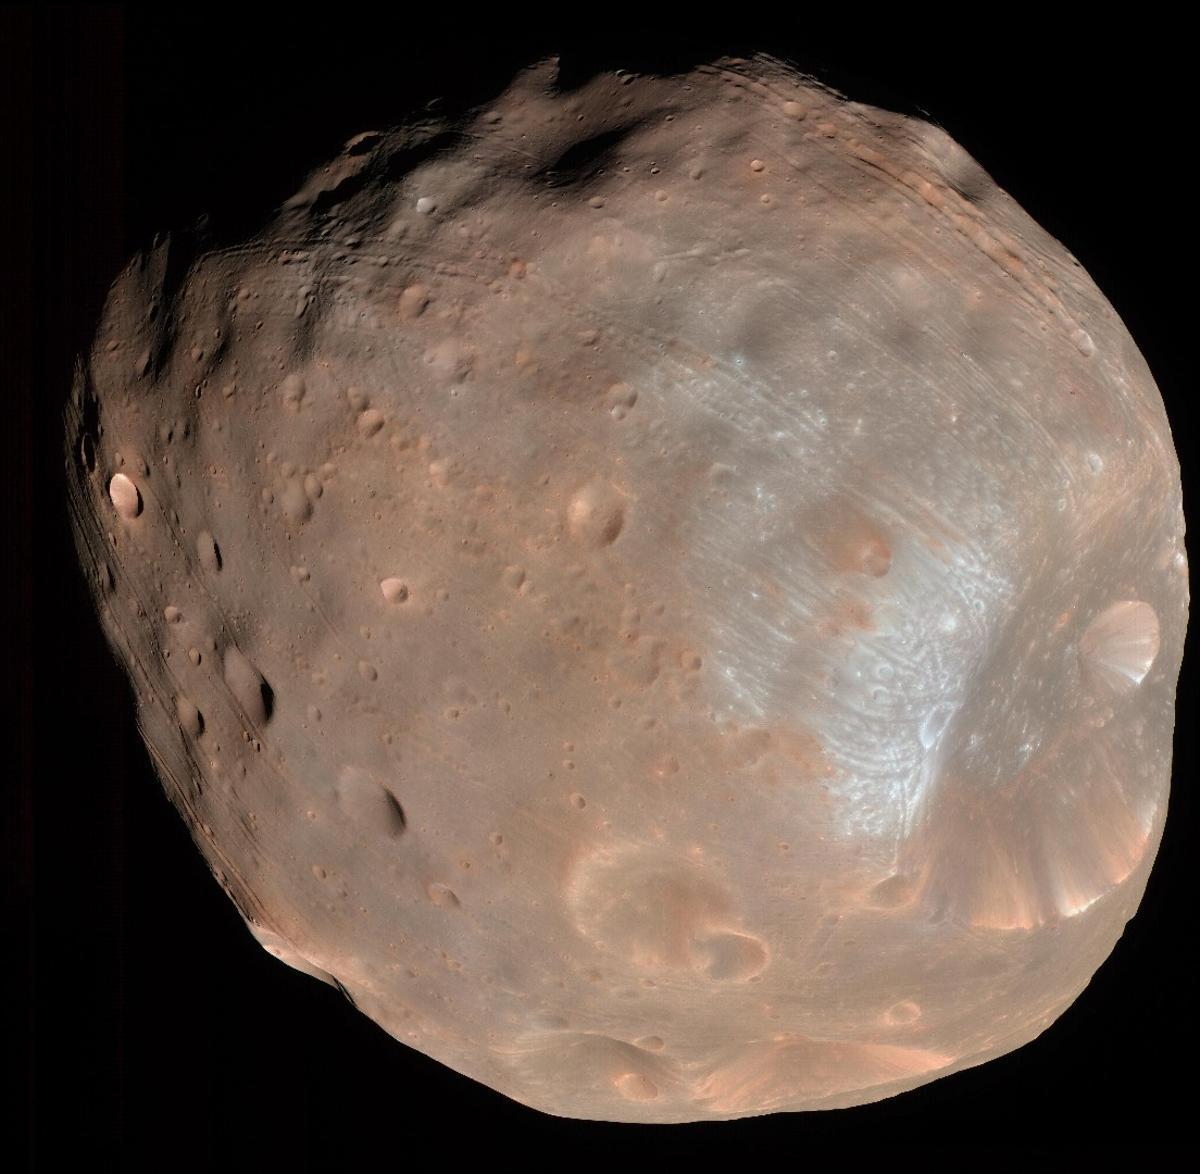 Phobos, as seen byNASA's Mars Reconnaissance Orbiter